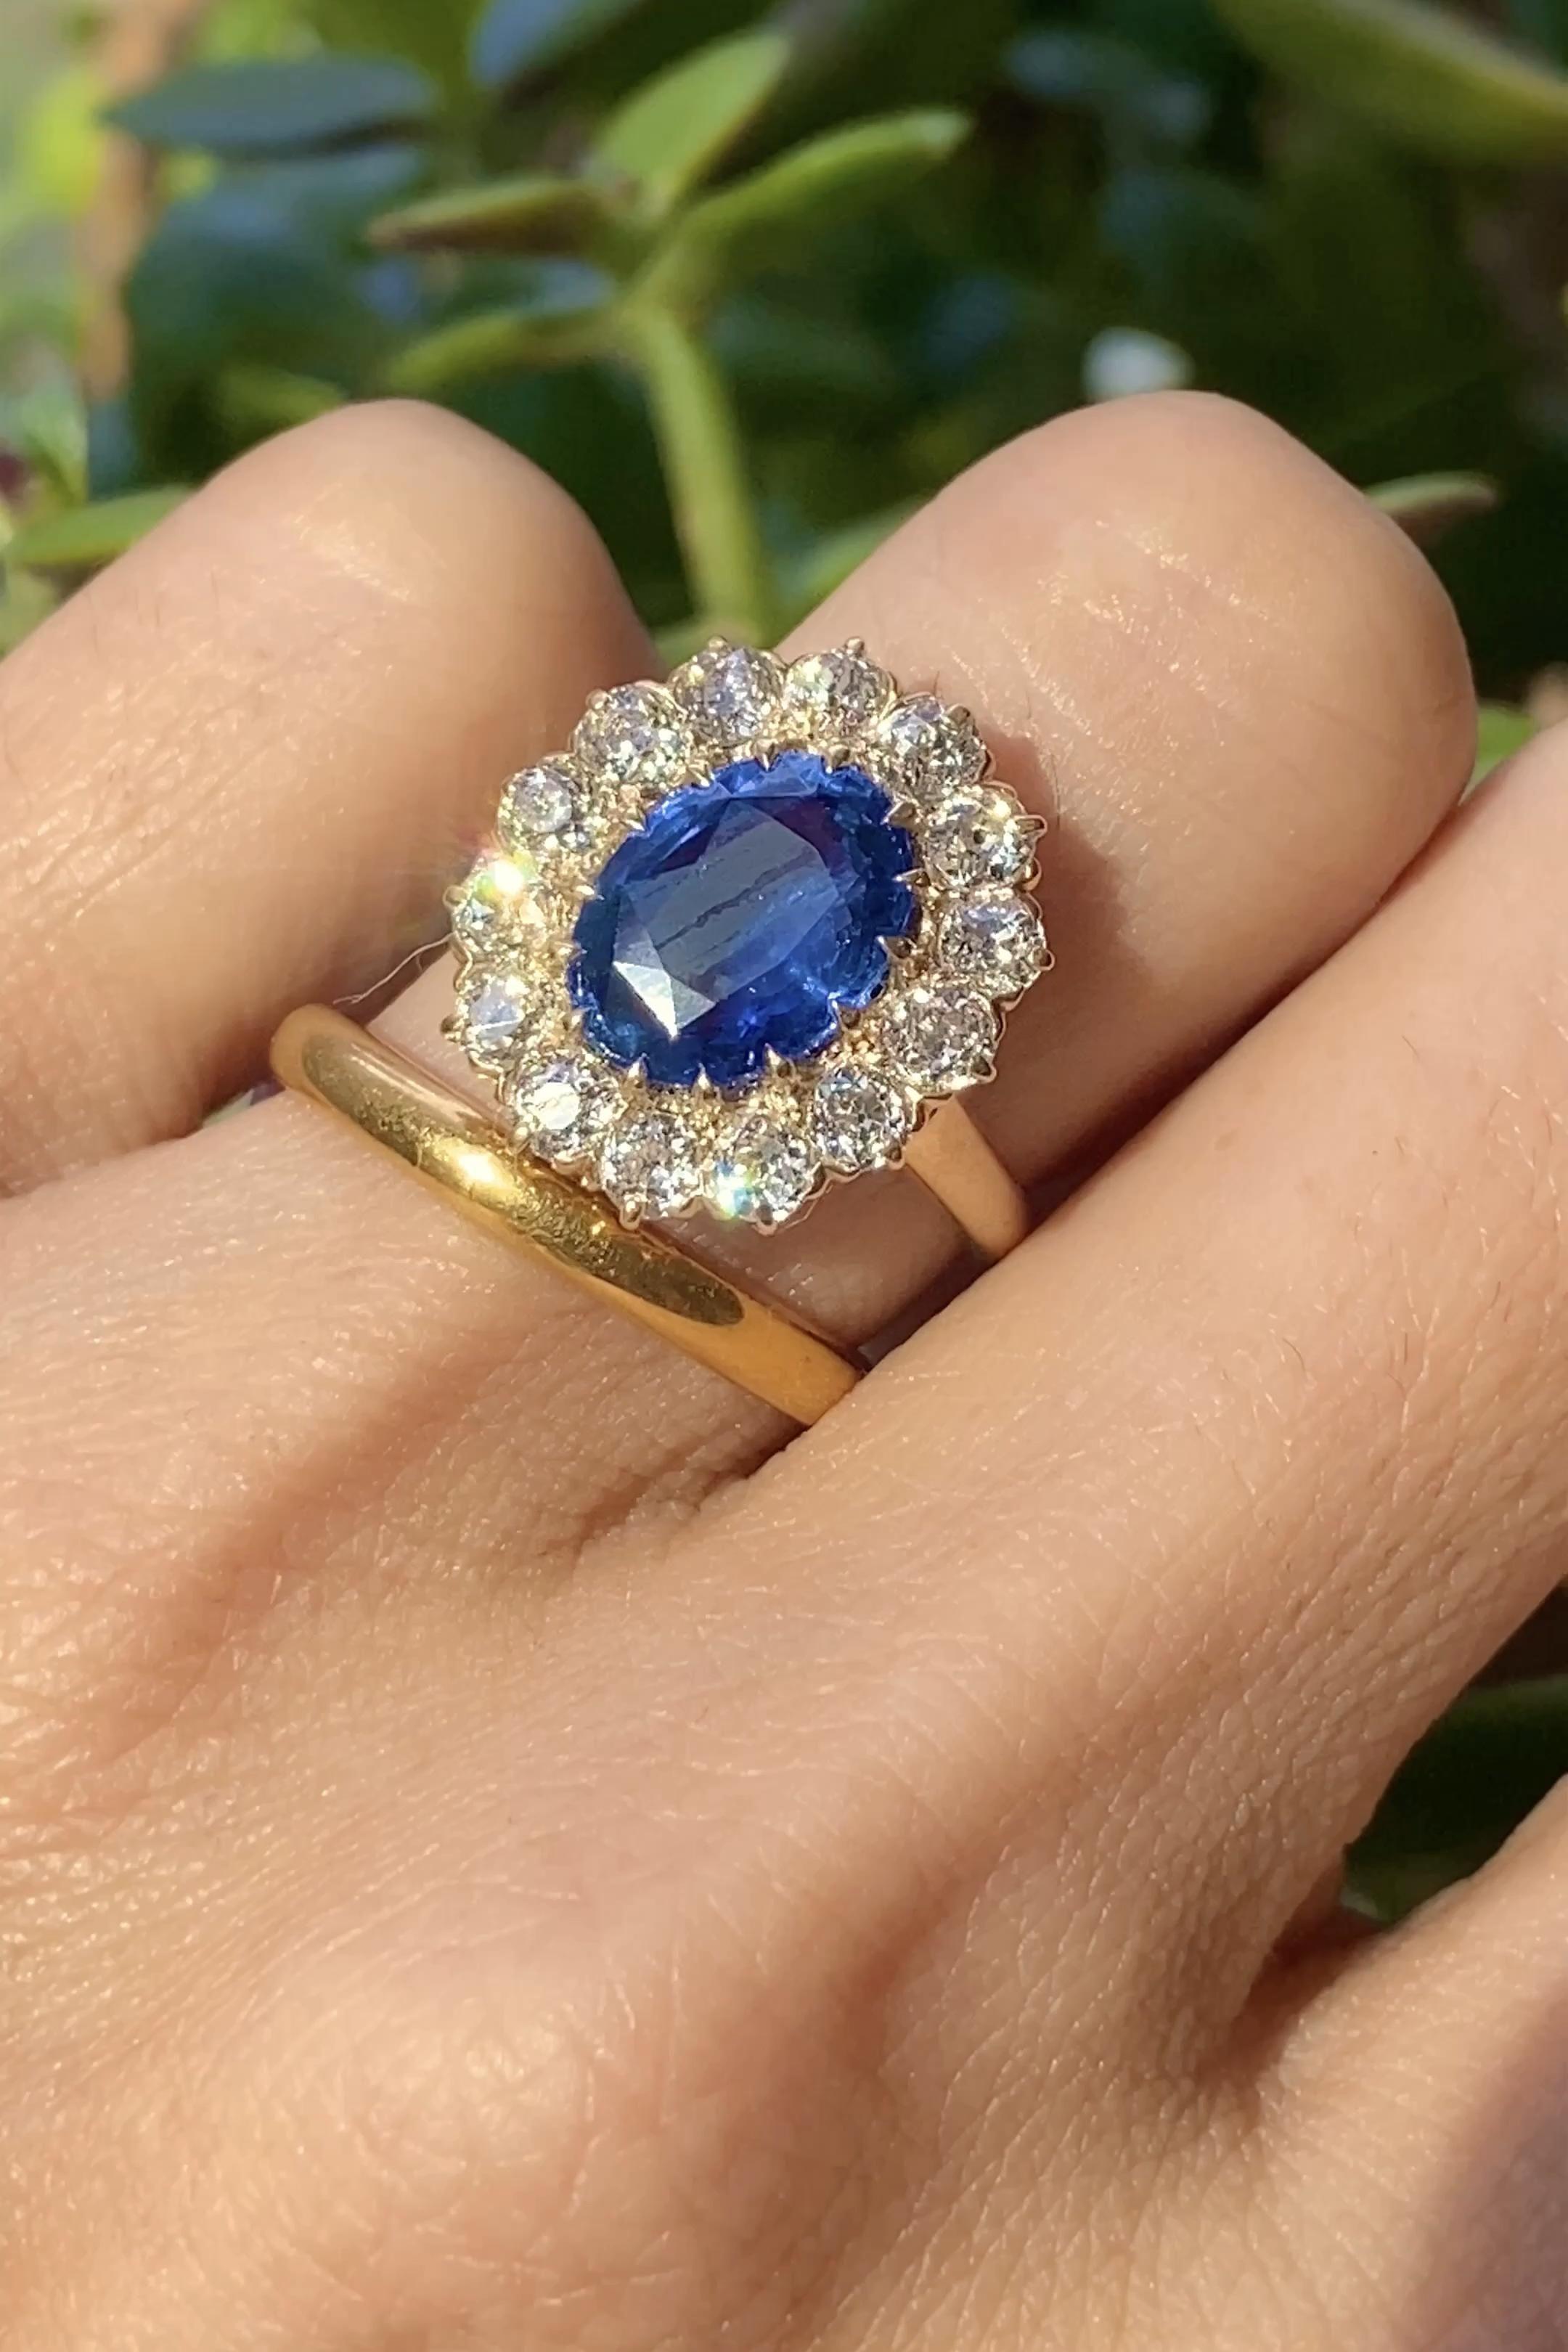 Oval Cut Blue Sapphire Montana CZ 18k Gold Over Ring 5-10